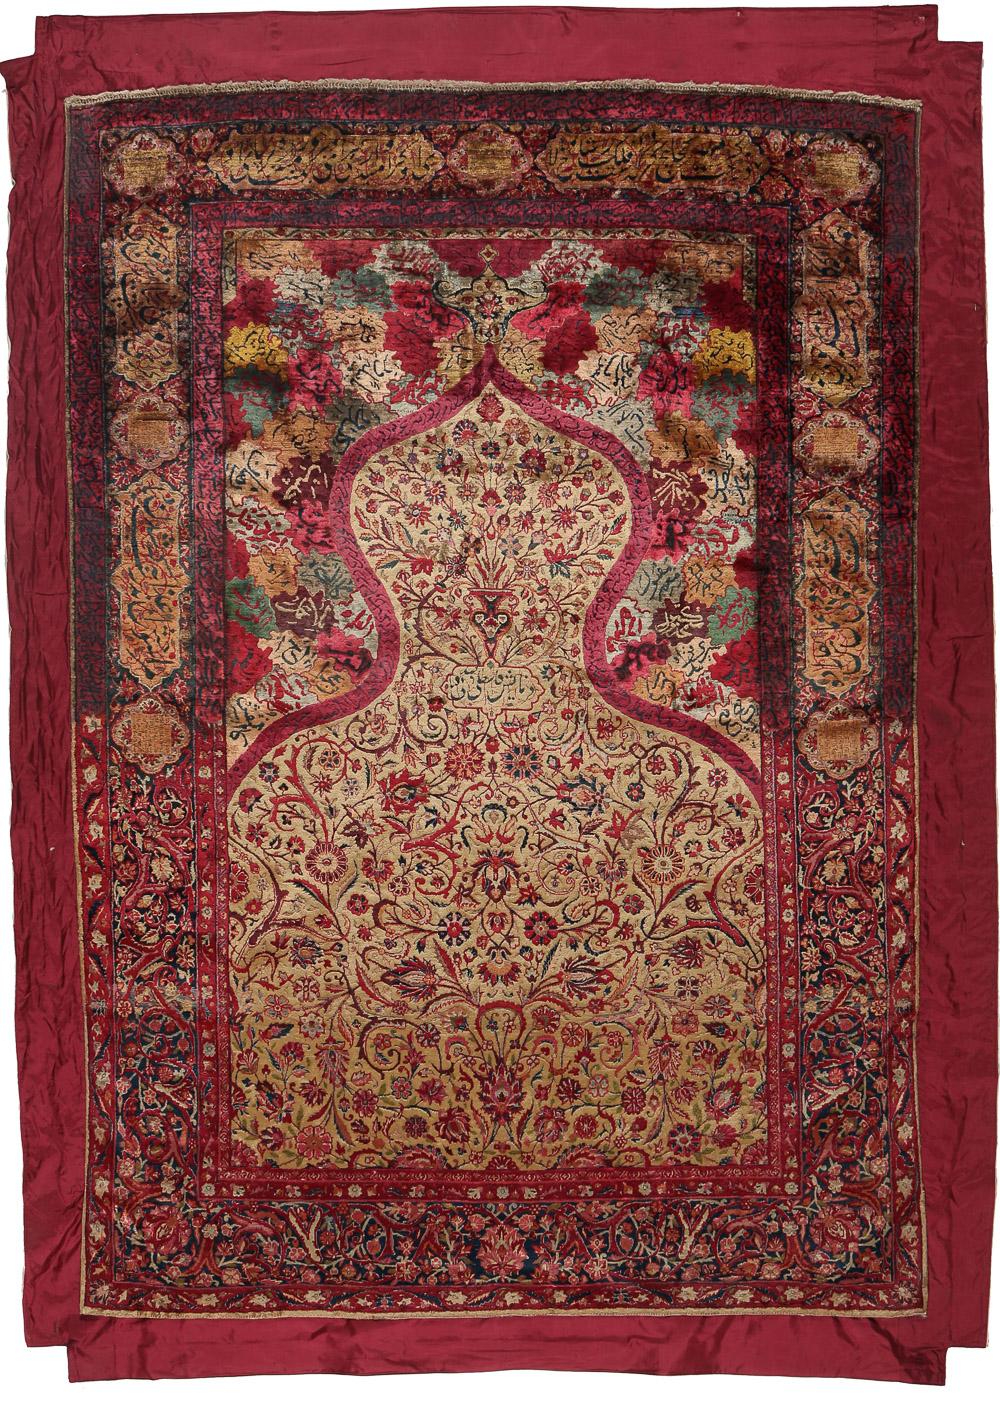 Kashan silk rug signed 'by order Kastelli and Sadaghiani', 194 x 135 cm